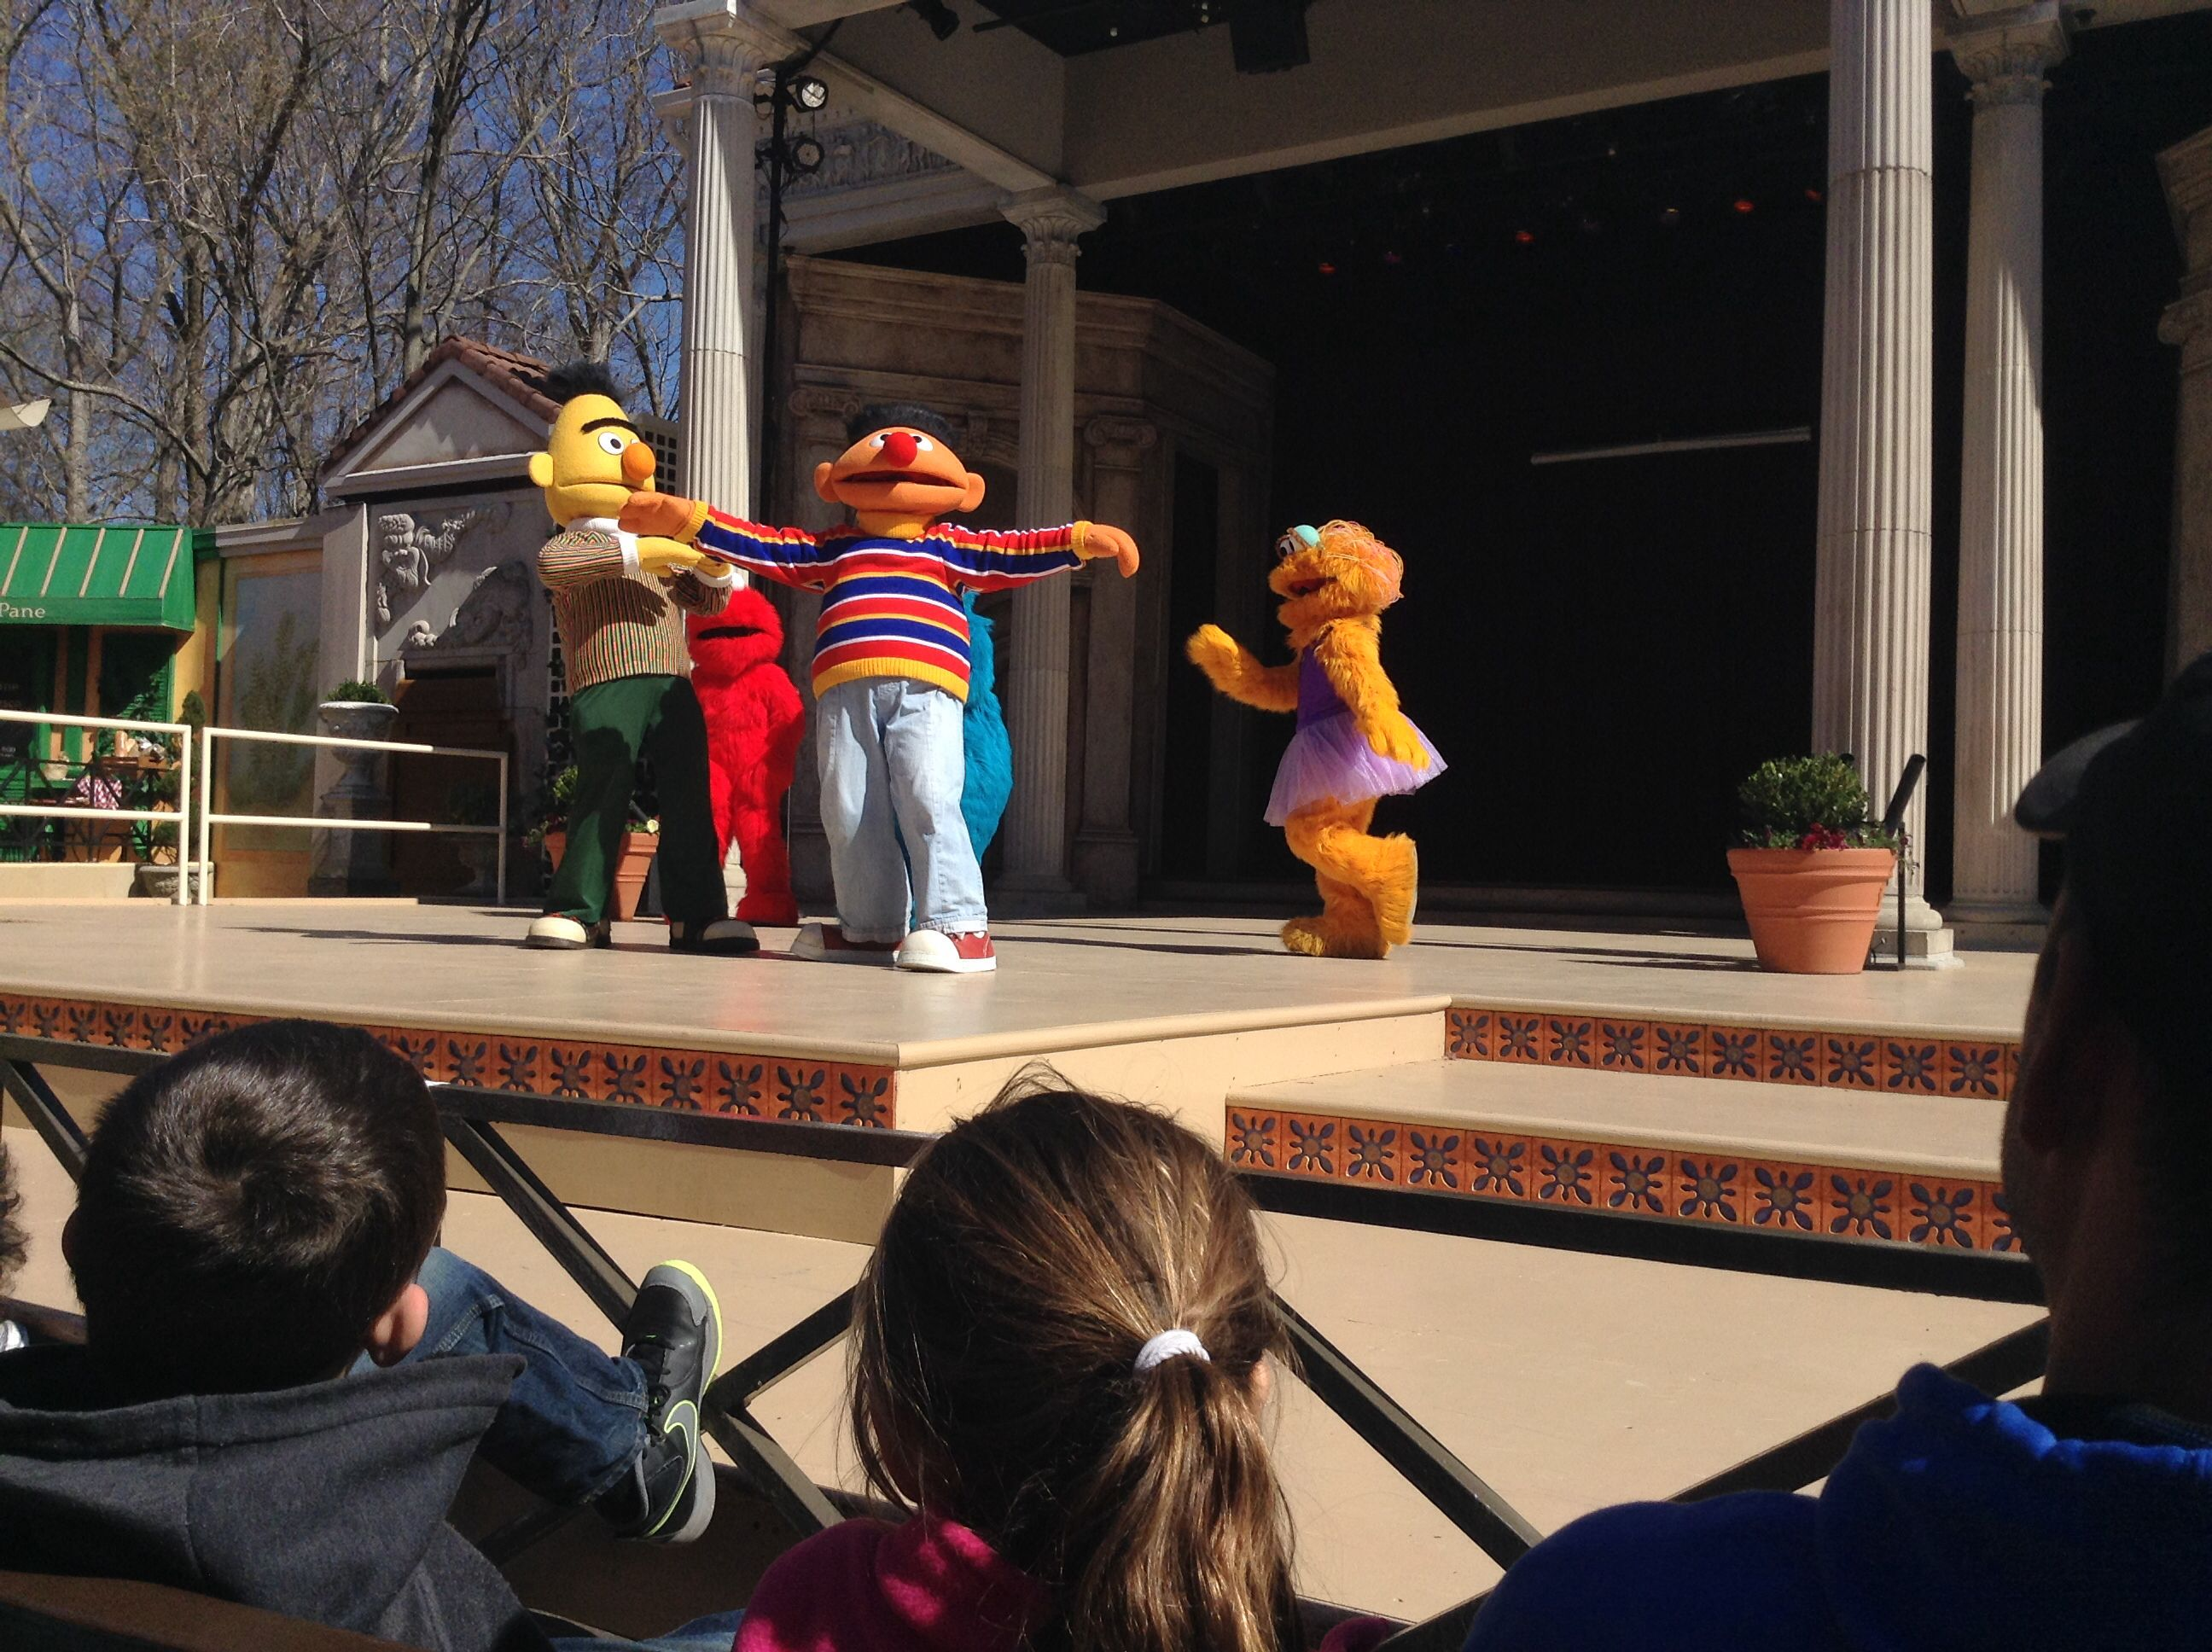 5bedcd6cc9afe4983ec38399ec26c3b7 - Courtyard Williamsburg Busch Gardens Area Reviews